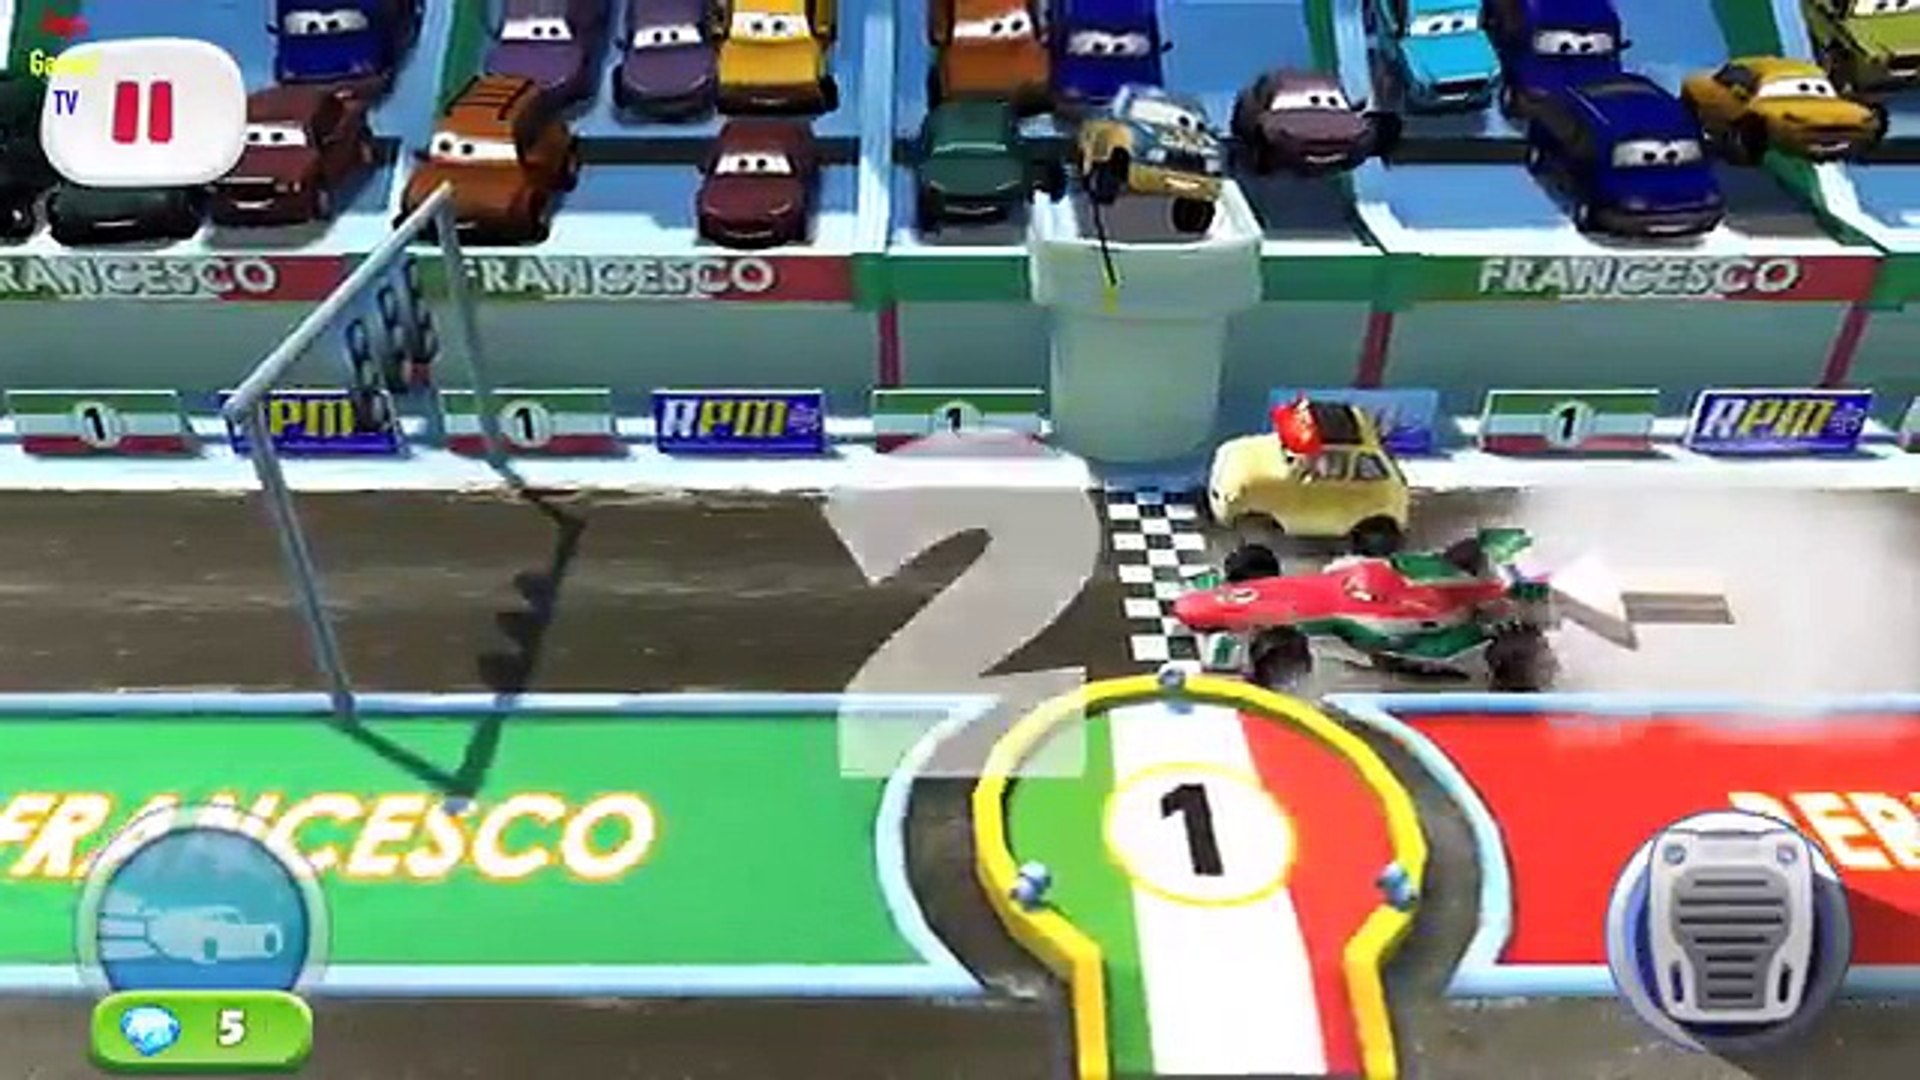 Disney Pixar Cars Fast as Lightning - Francesco Stage 1/4 vs Luigi, Guido, DJ